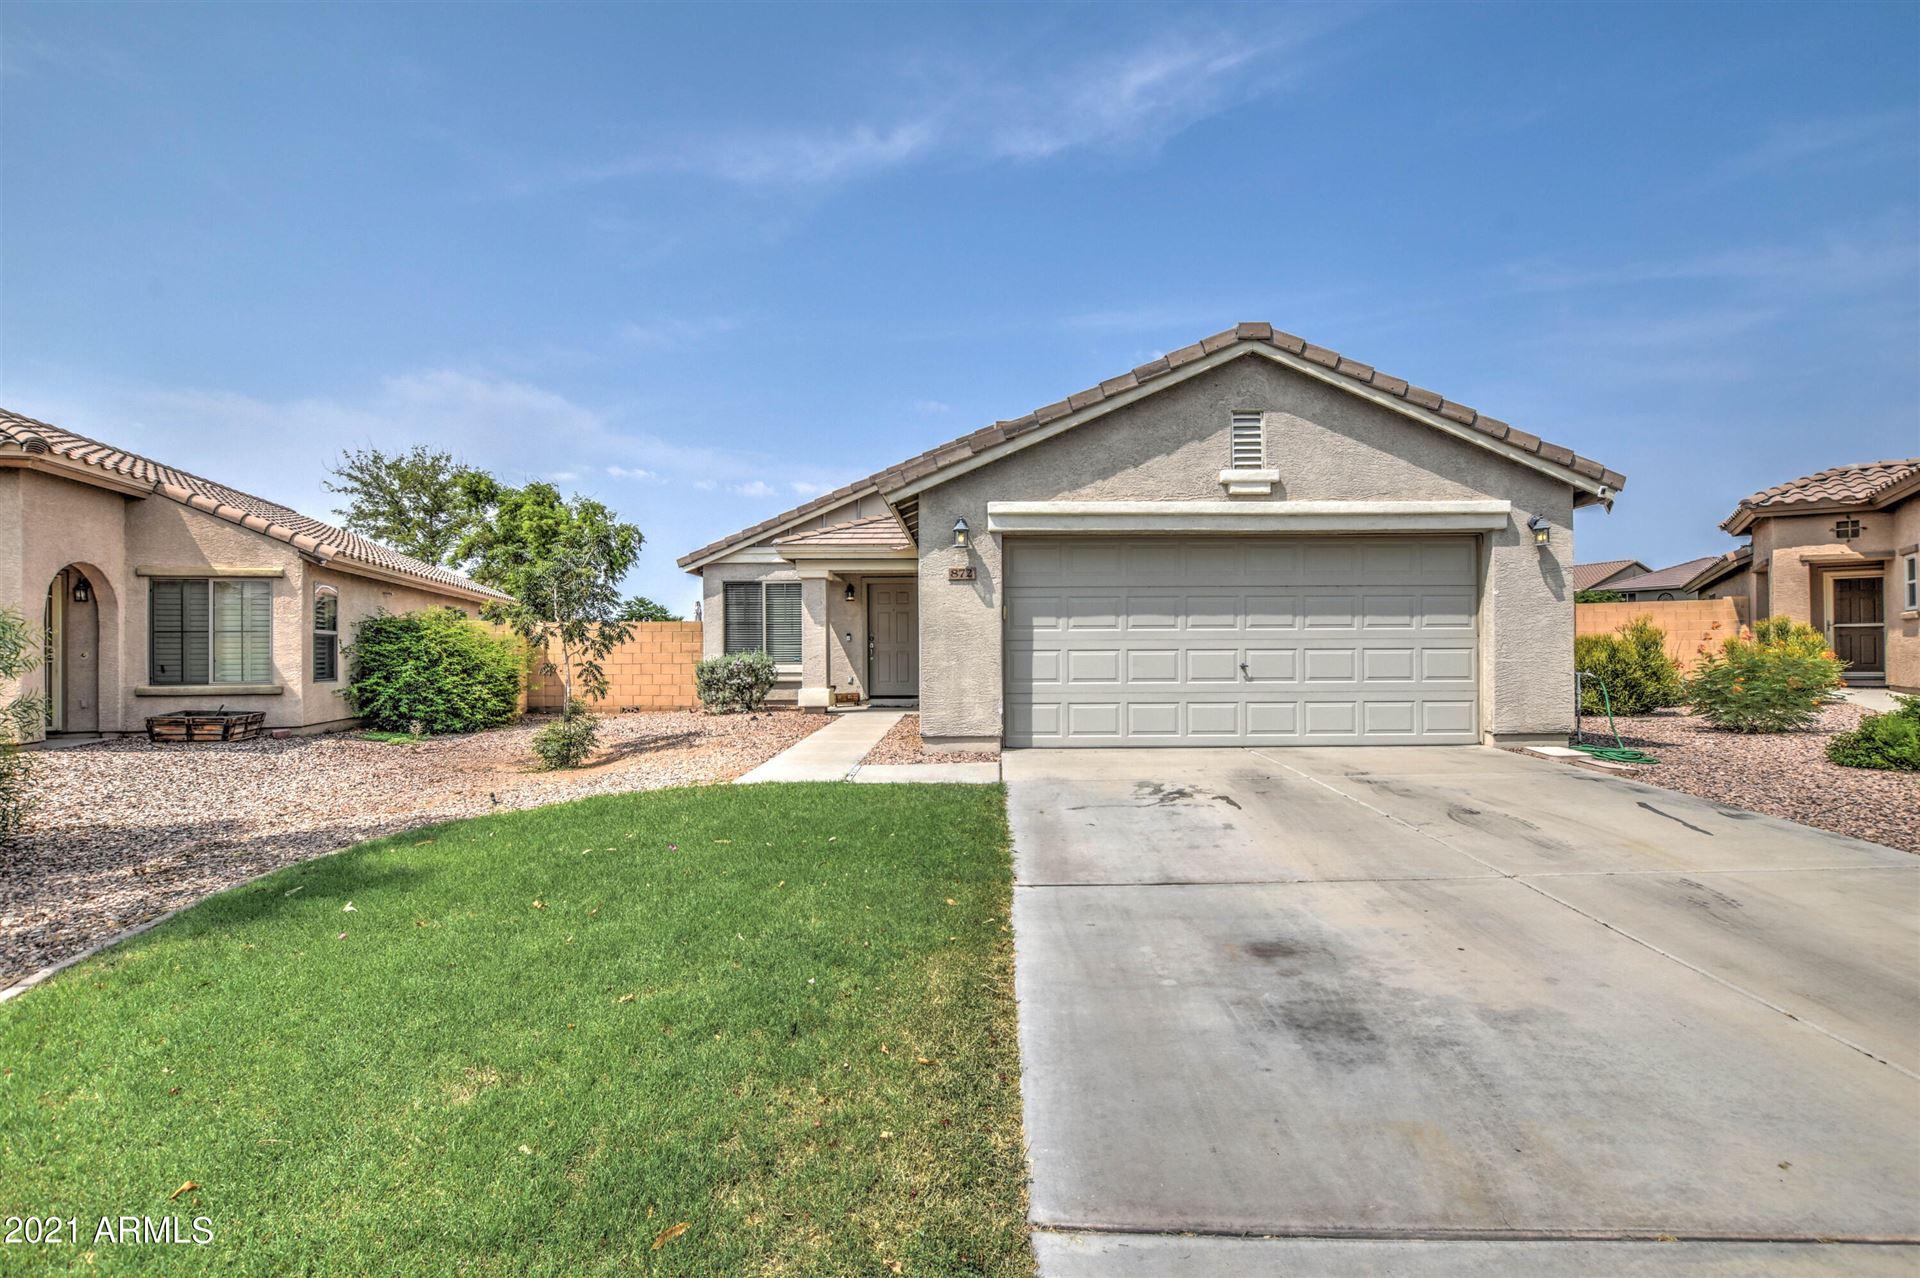 Photo of 872 W DESERT HILLS Drive, San Tan Valley, AZ 85143 (MLS # 6268818)